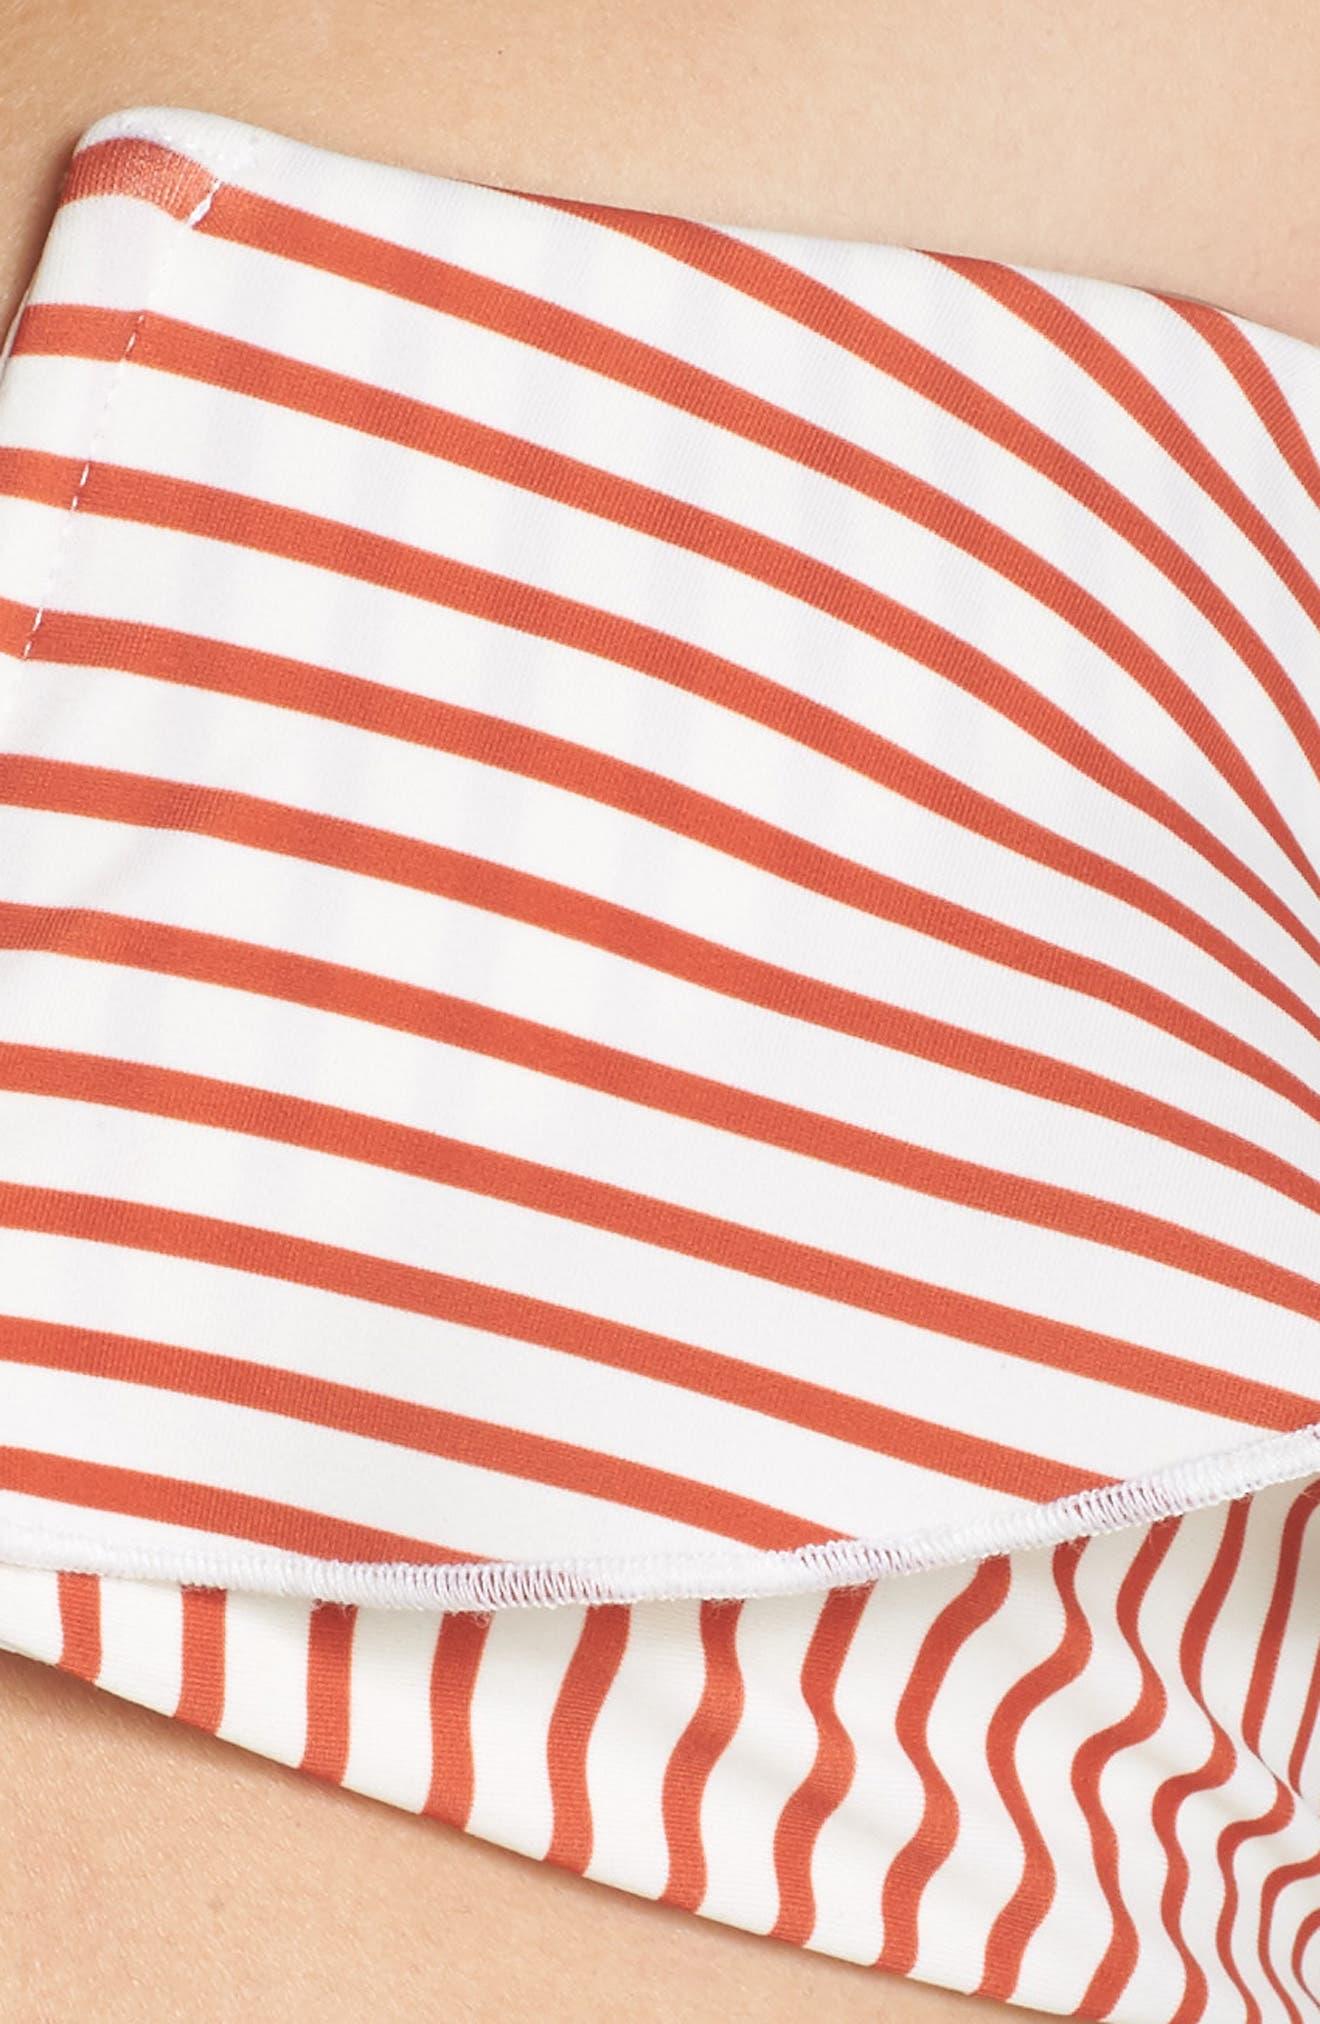 Coco Notch Front Bikini Top,                             Alternate thumbnail 5, color,                             600